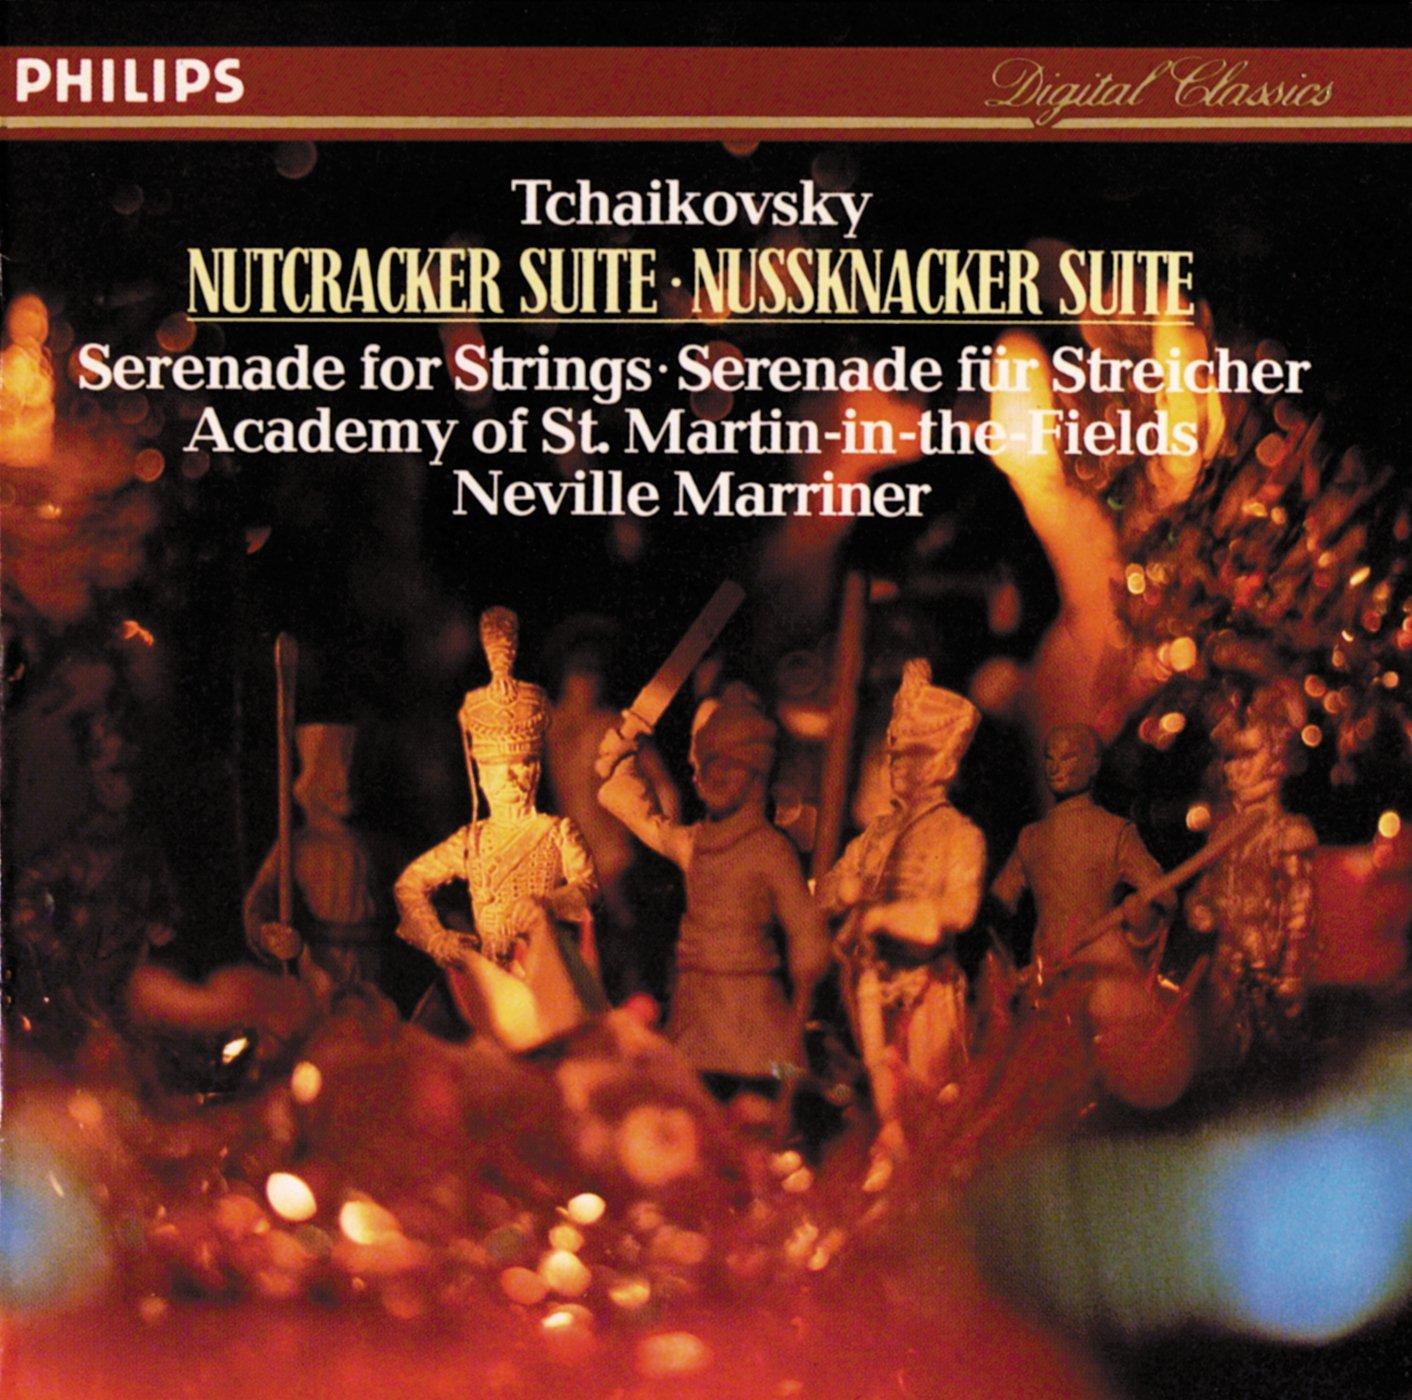 Tchaikovsky: Nutcracker Suitte, Serenade for Strings